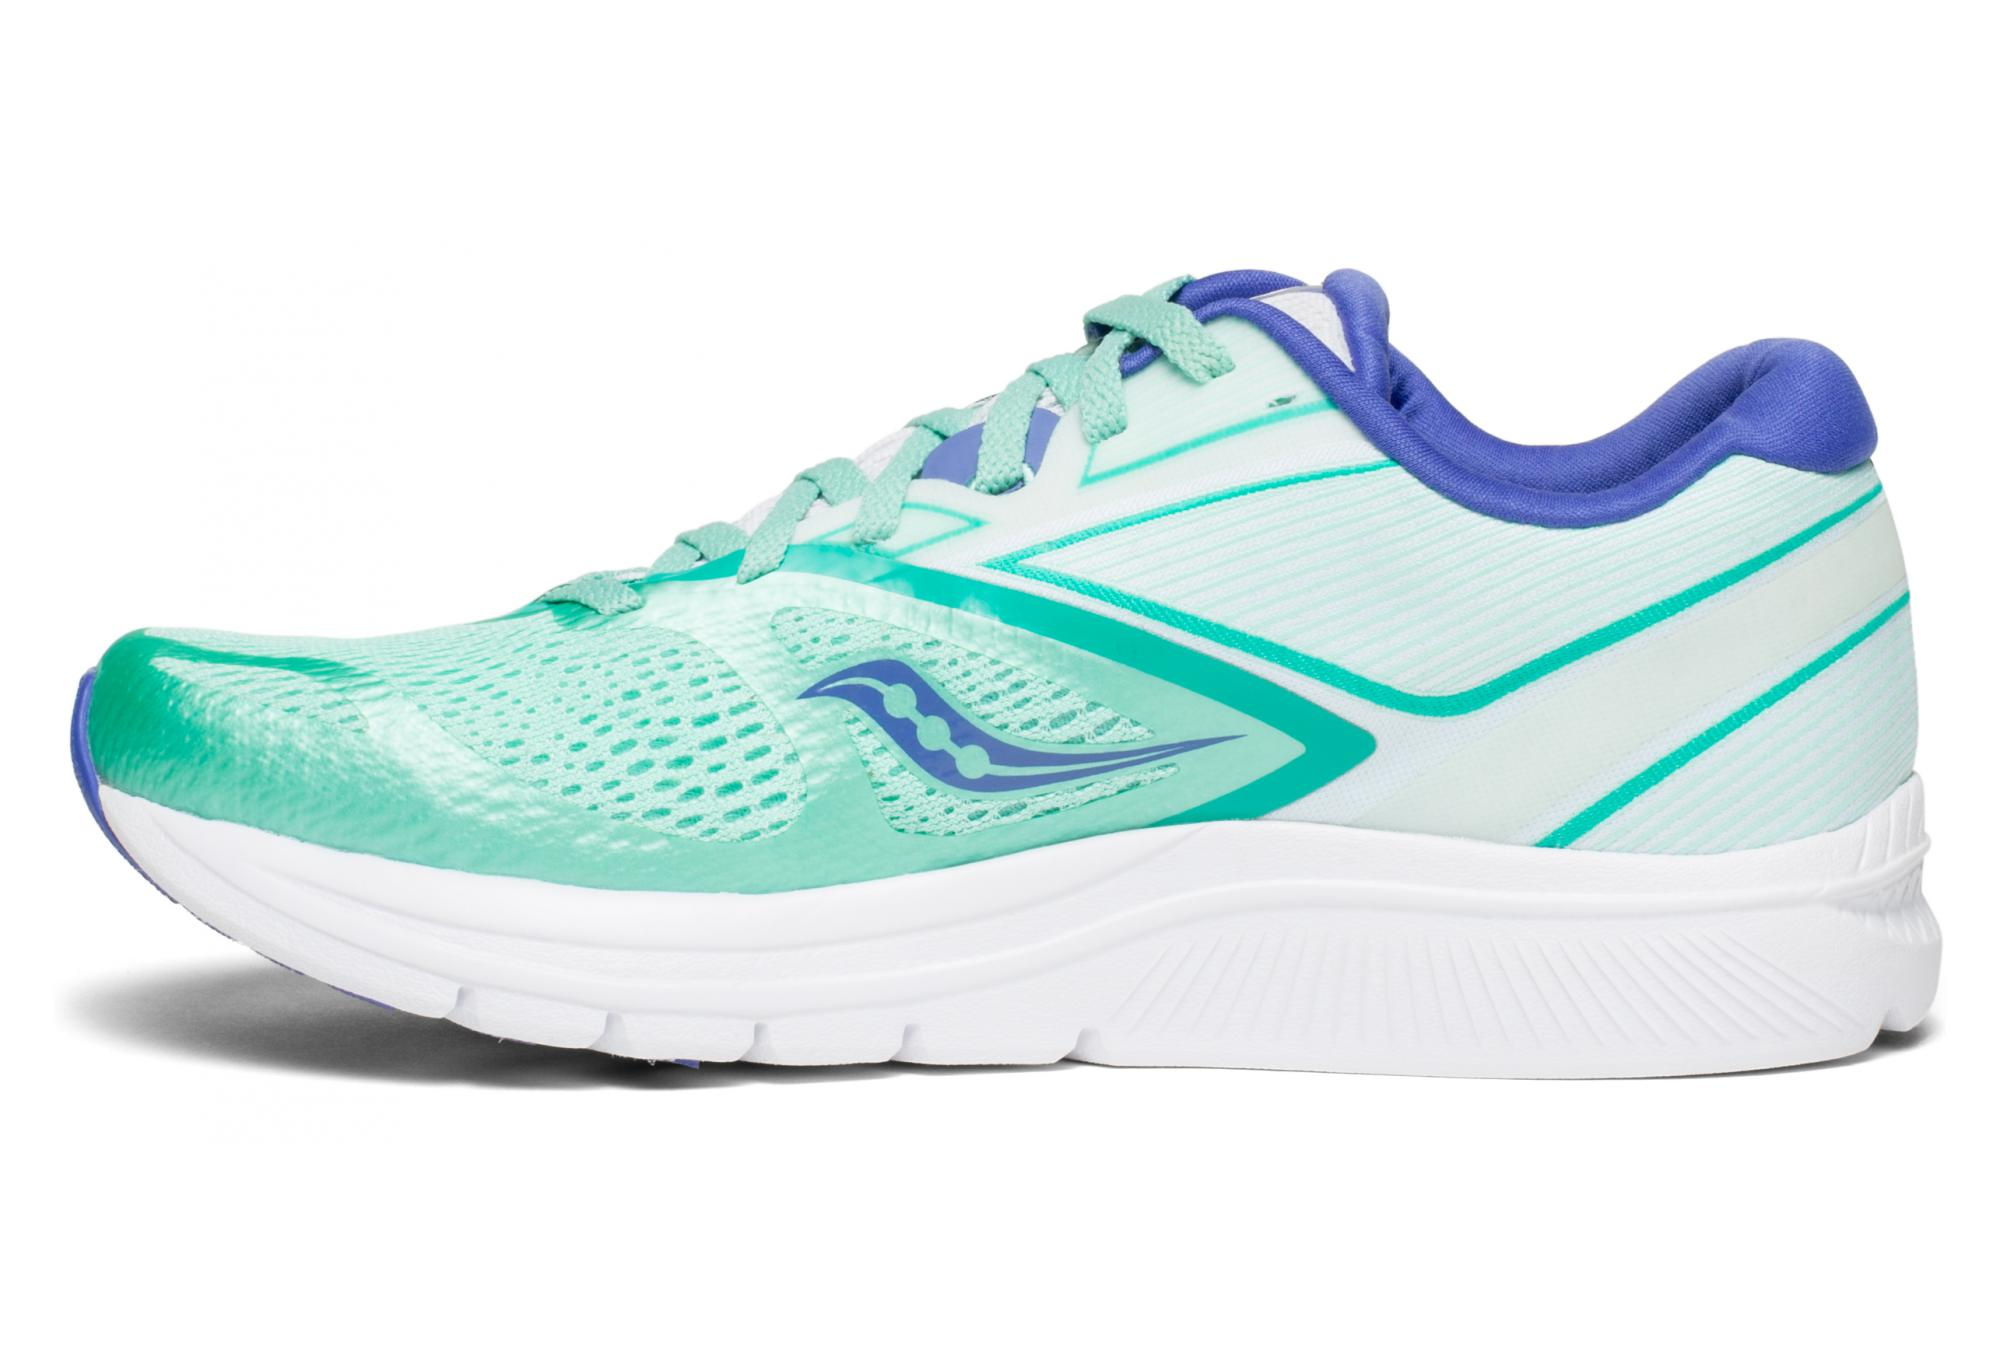 separation shoes 9a612 889ab Saucony KINVARA 9 White